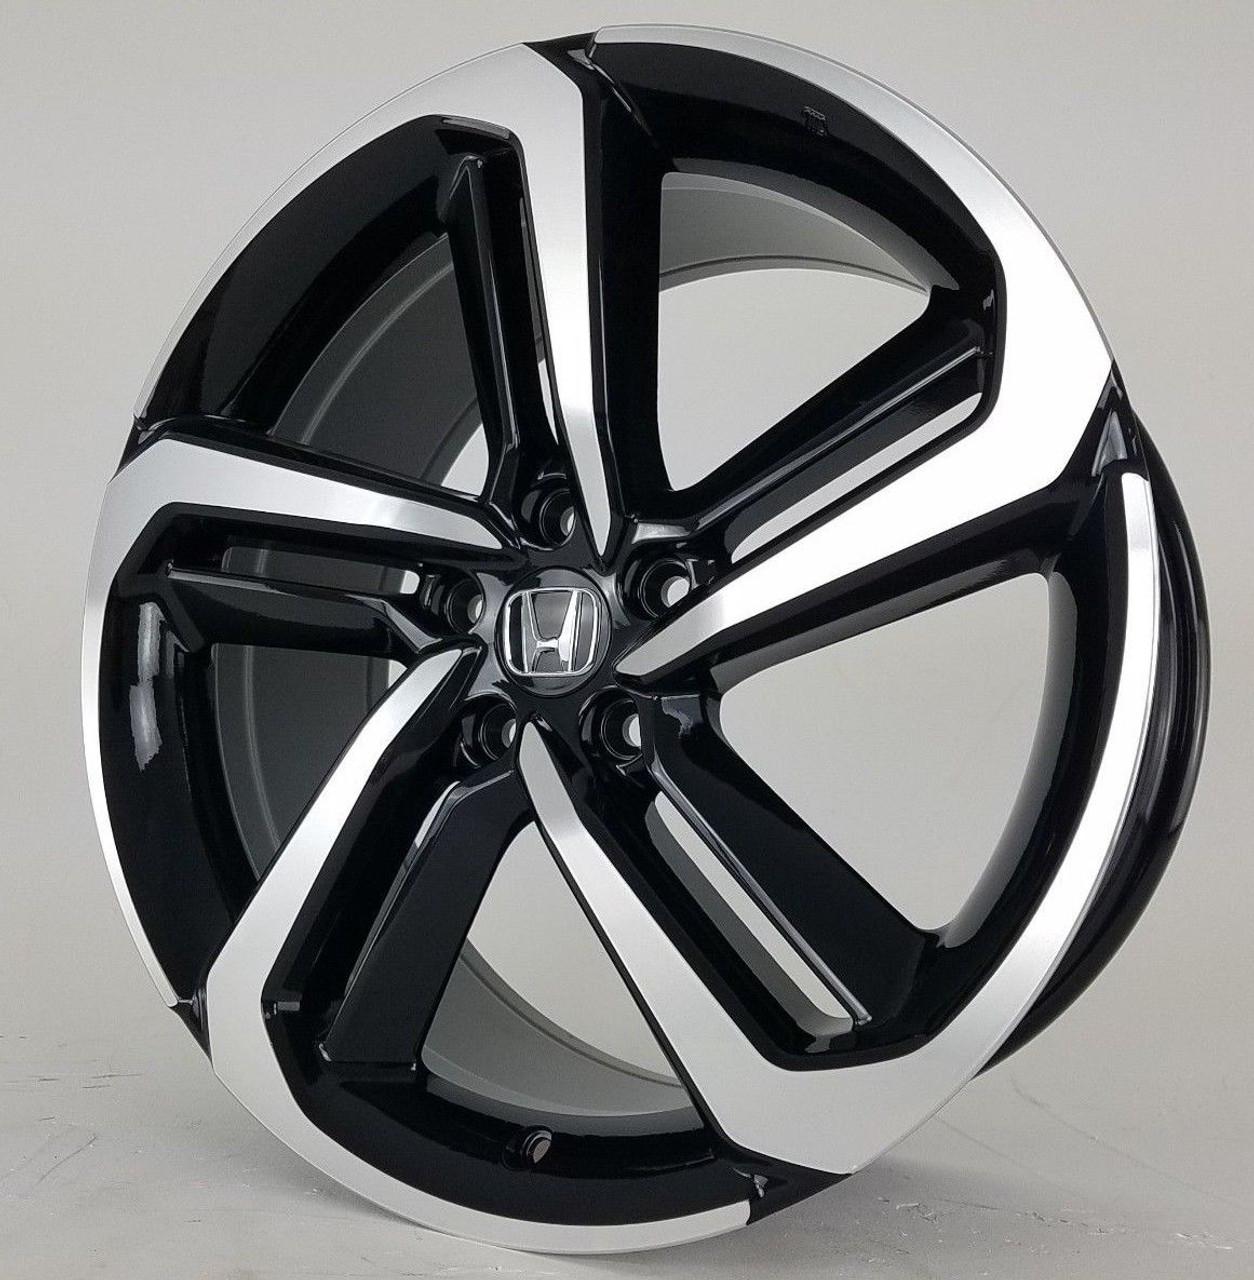 Honda Factory Rims >> 19 2018 19 Fits Honda Accord Sport Civic Si Exl Acura Black Machined Wheels Set Of 4 19x8 5 Rims 64127